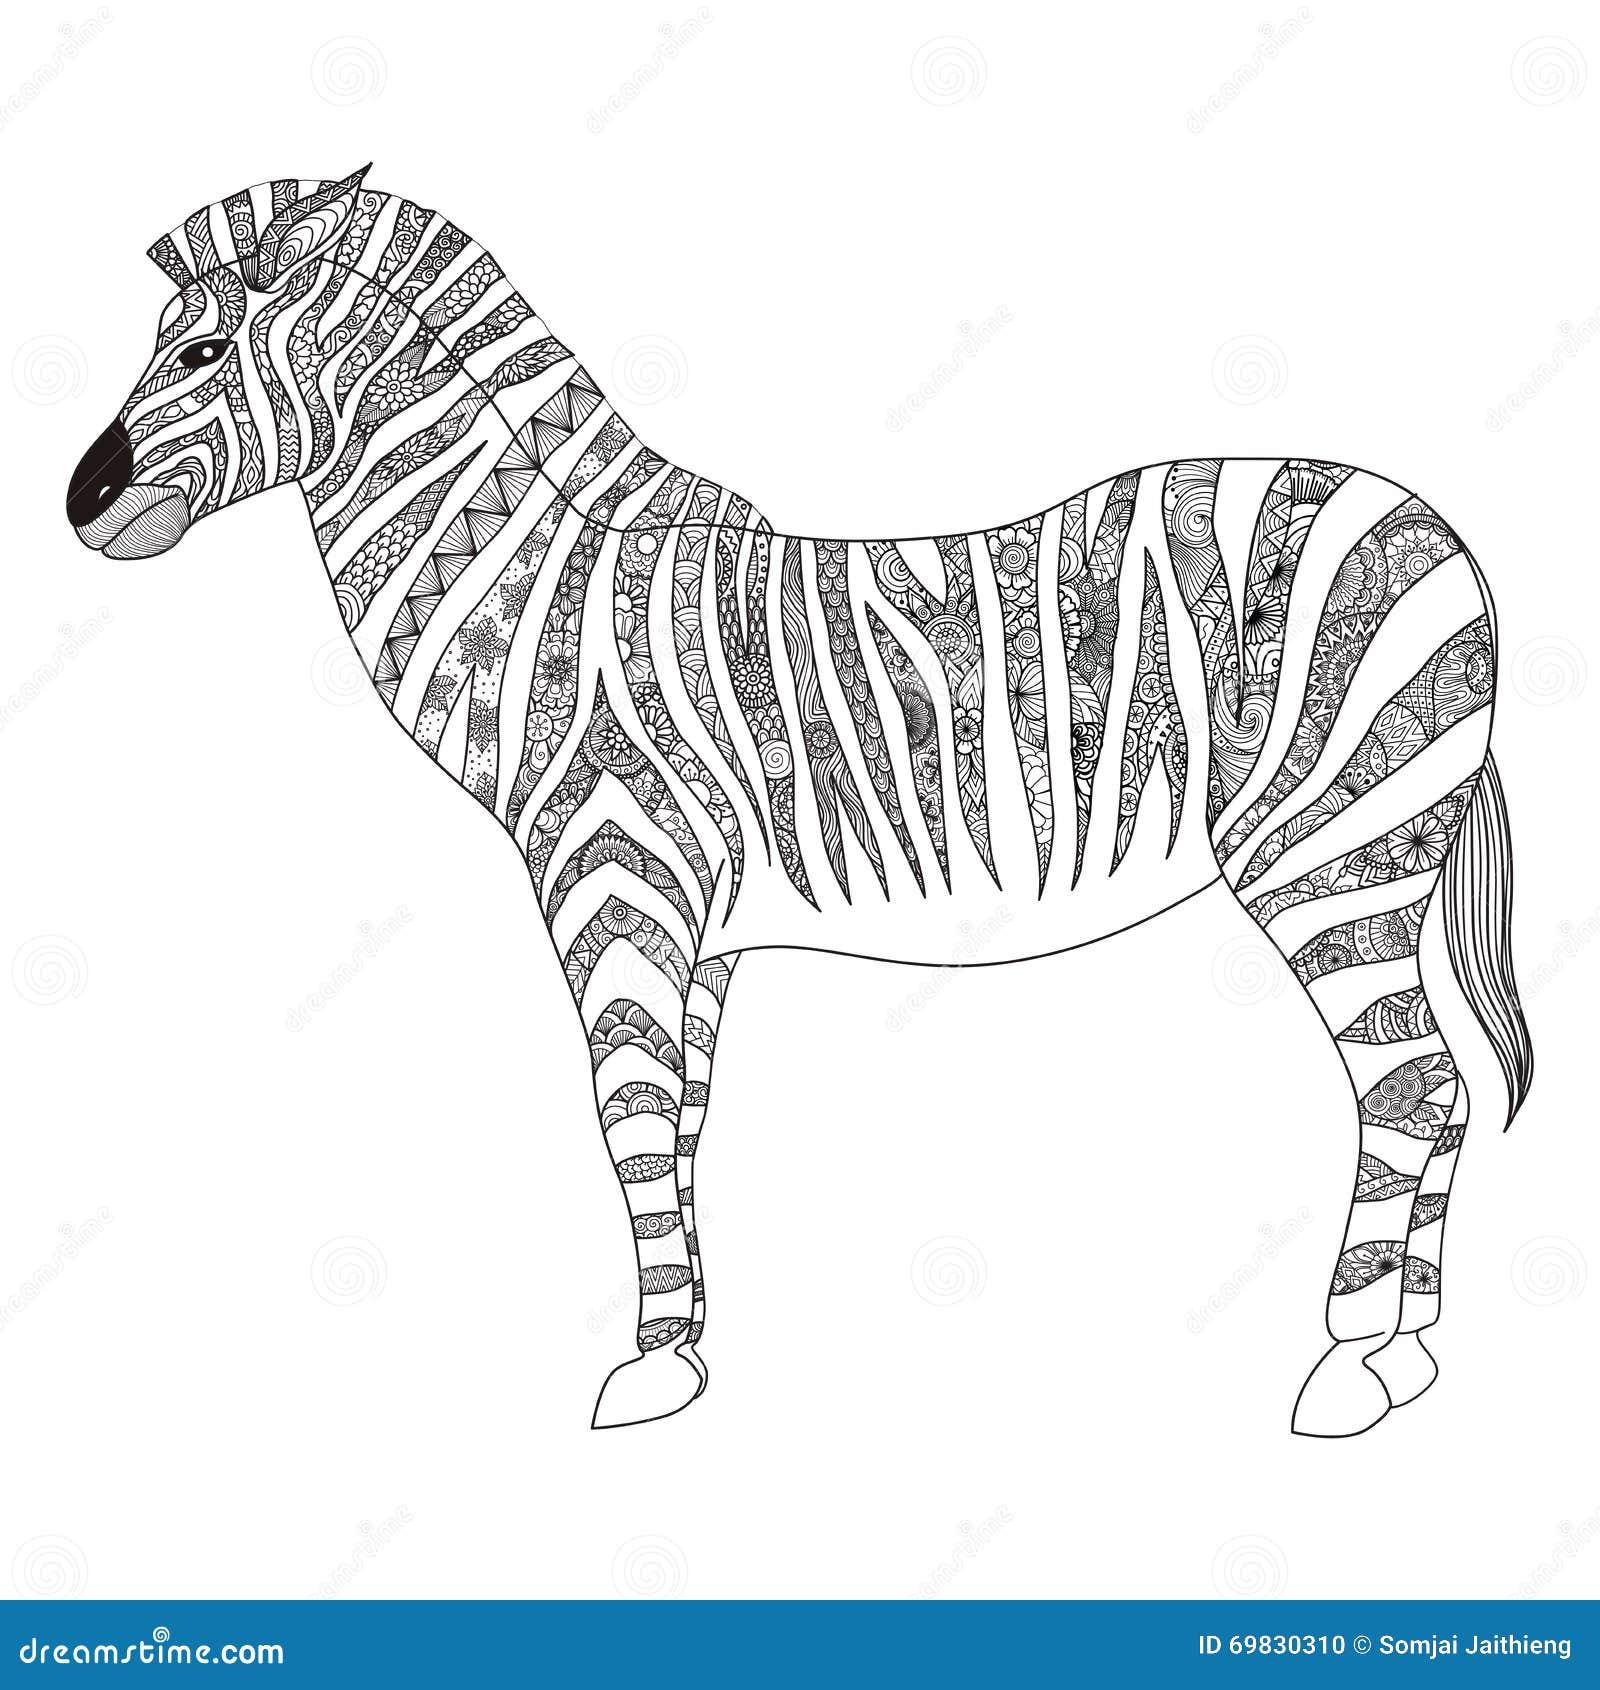 Zebra shirt design - Zebra Zentangle Stylized For T Shirt Design Sign Poster Coloring Book For